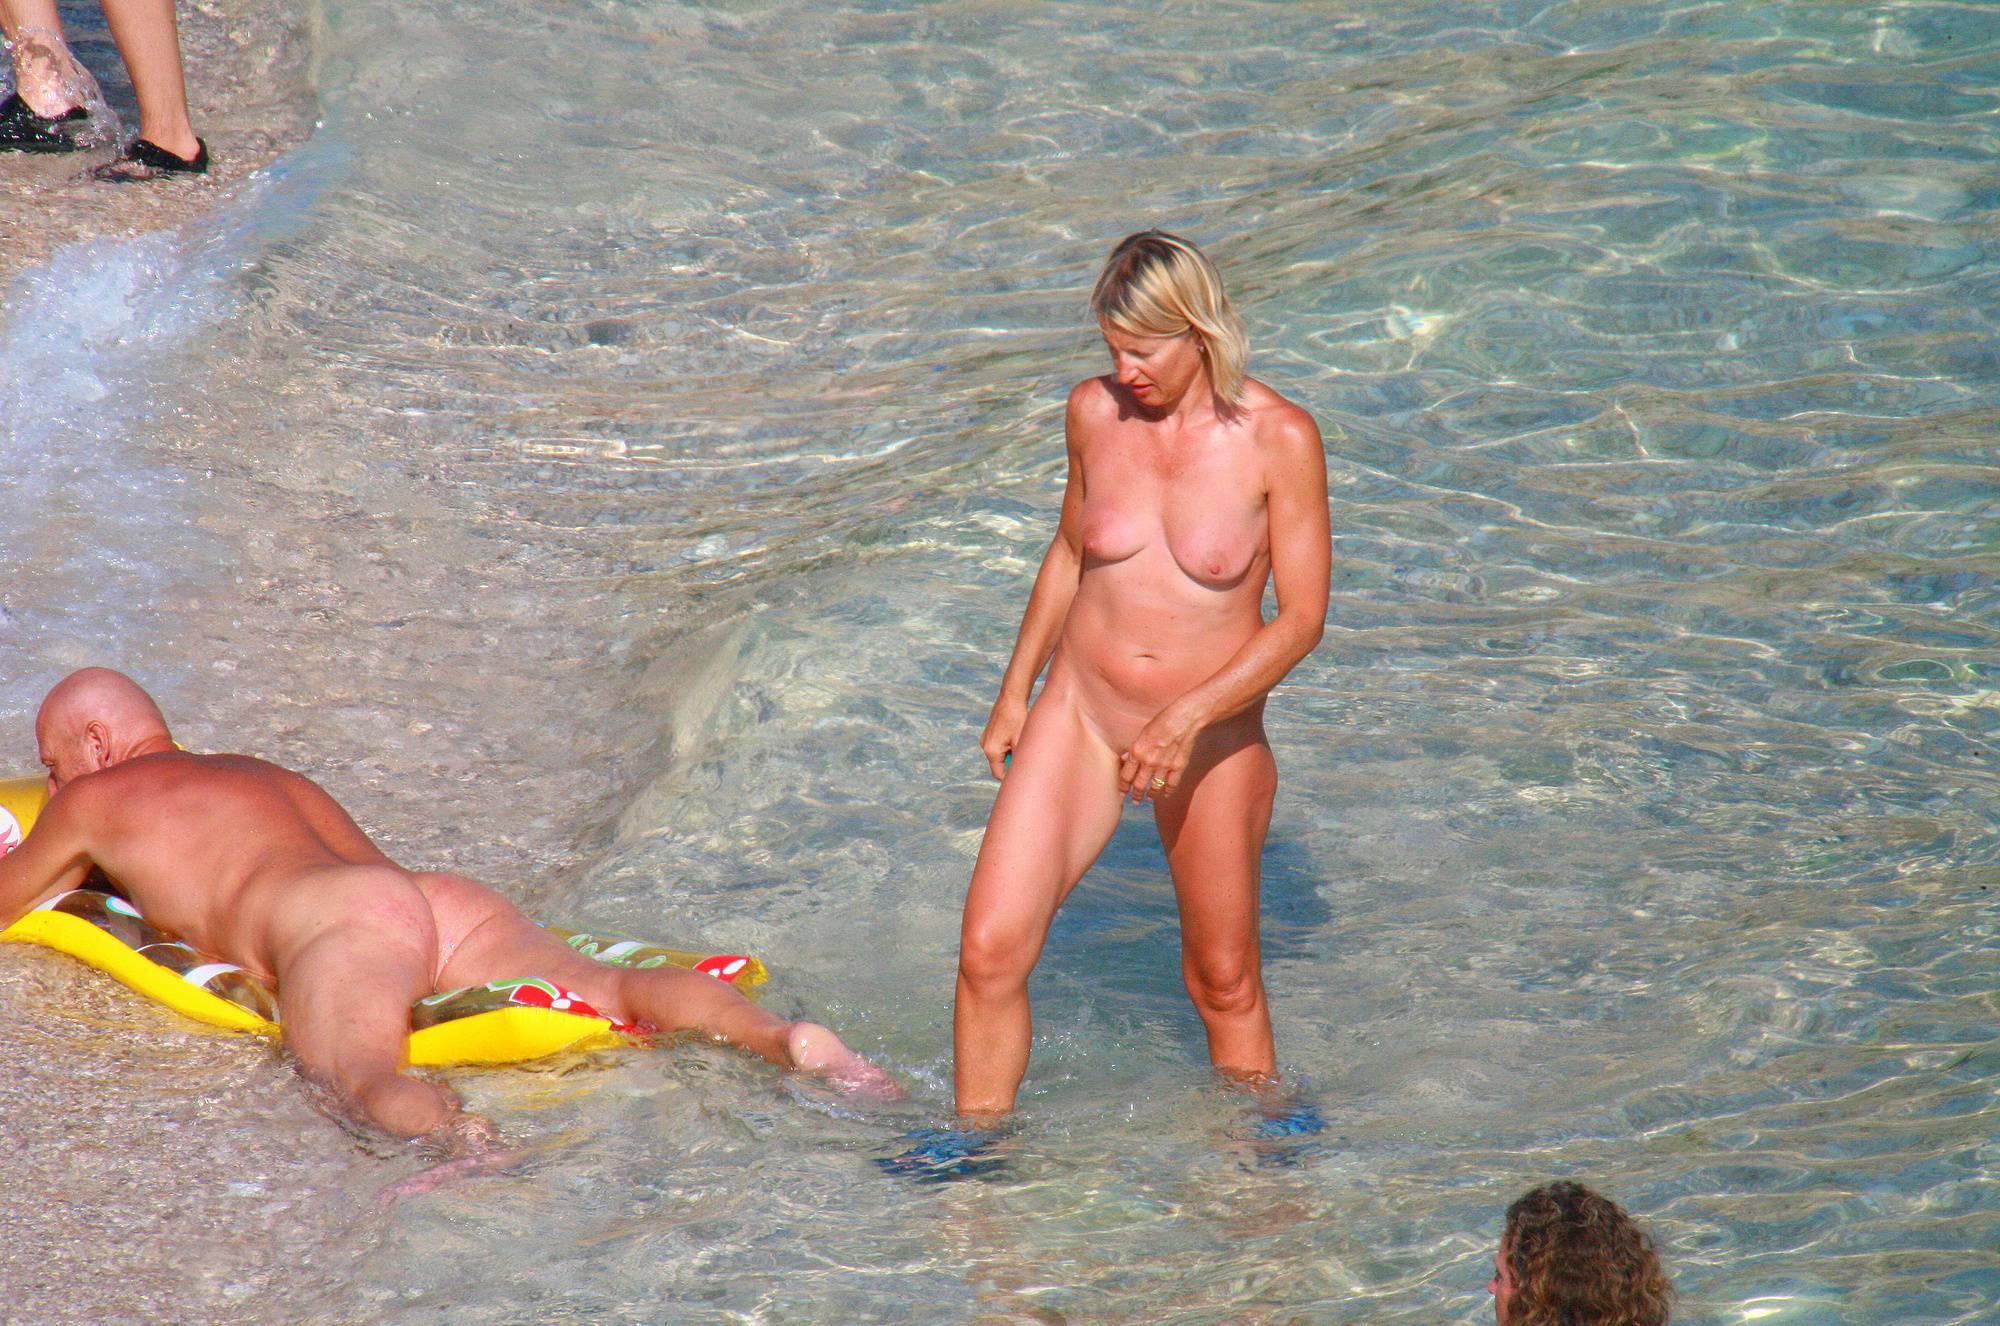 Nudist Pictures Ula FKK Water Floatables - 2